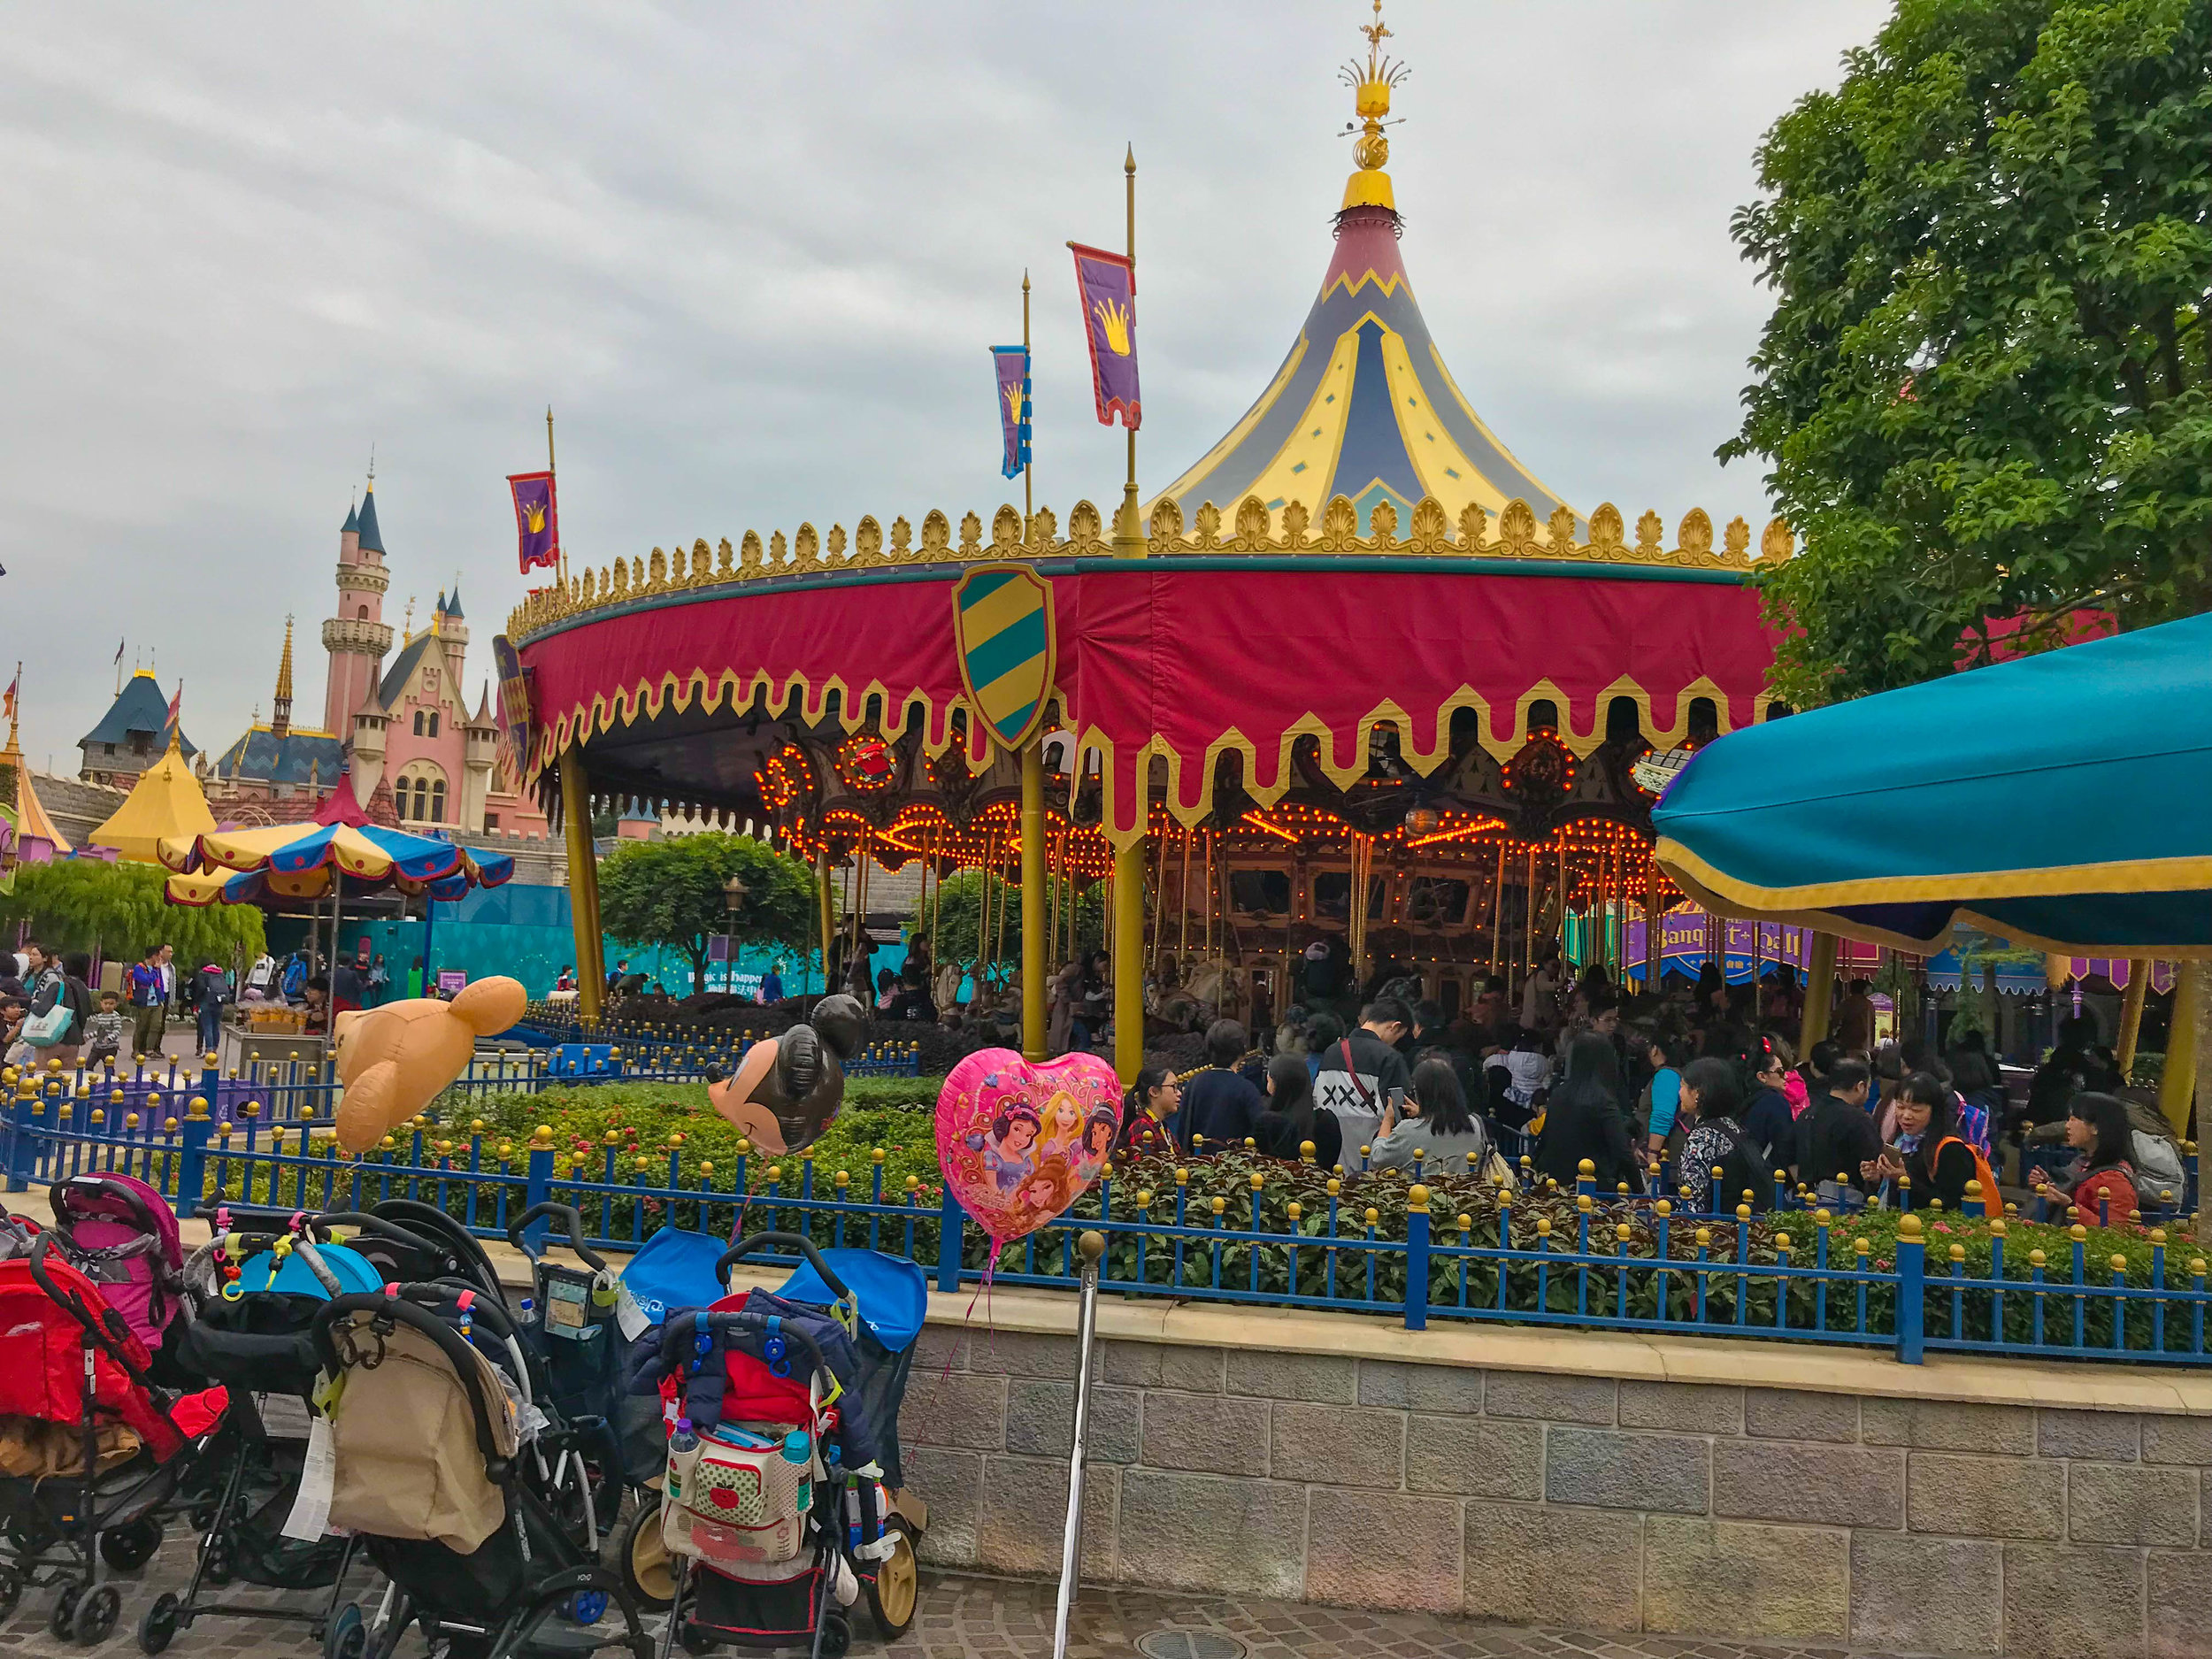 Hong-Kong-Disneyland-fantasyland.jpg